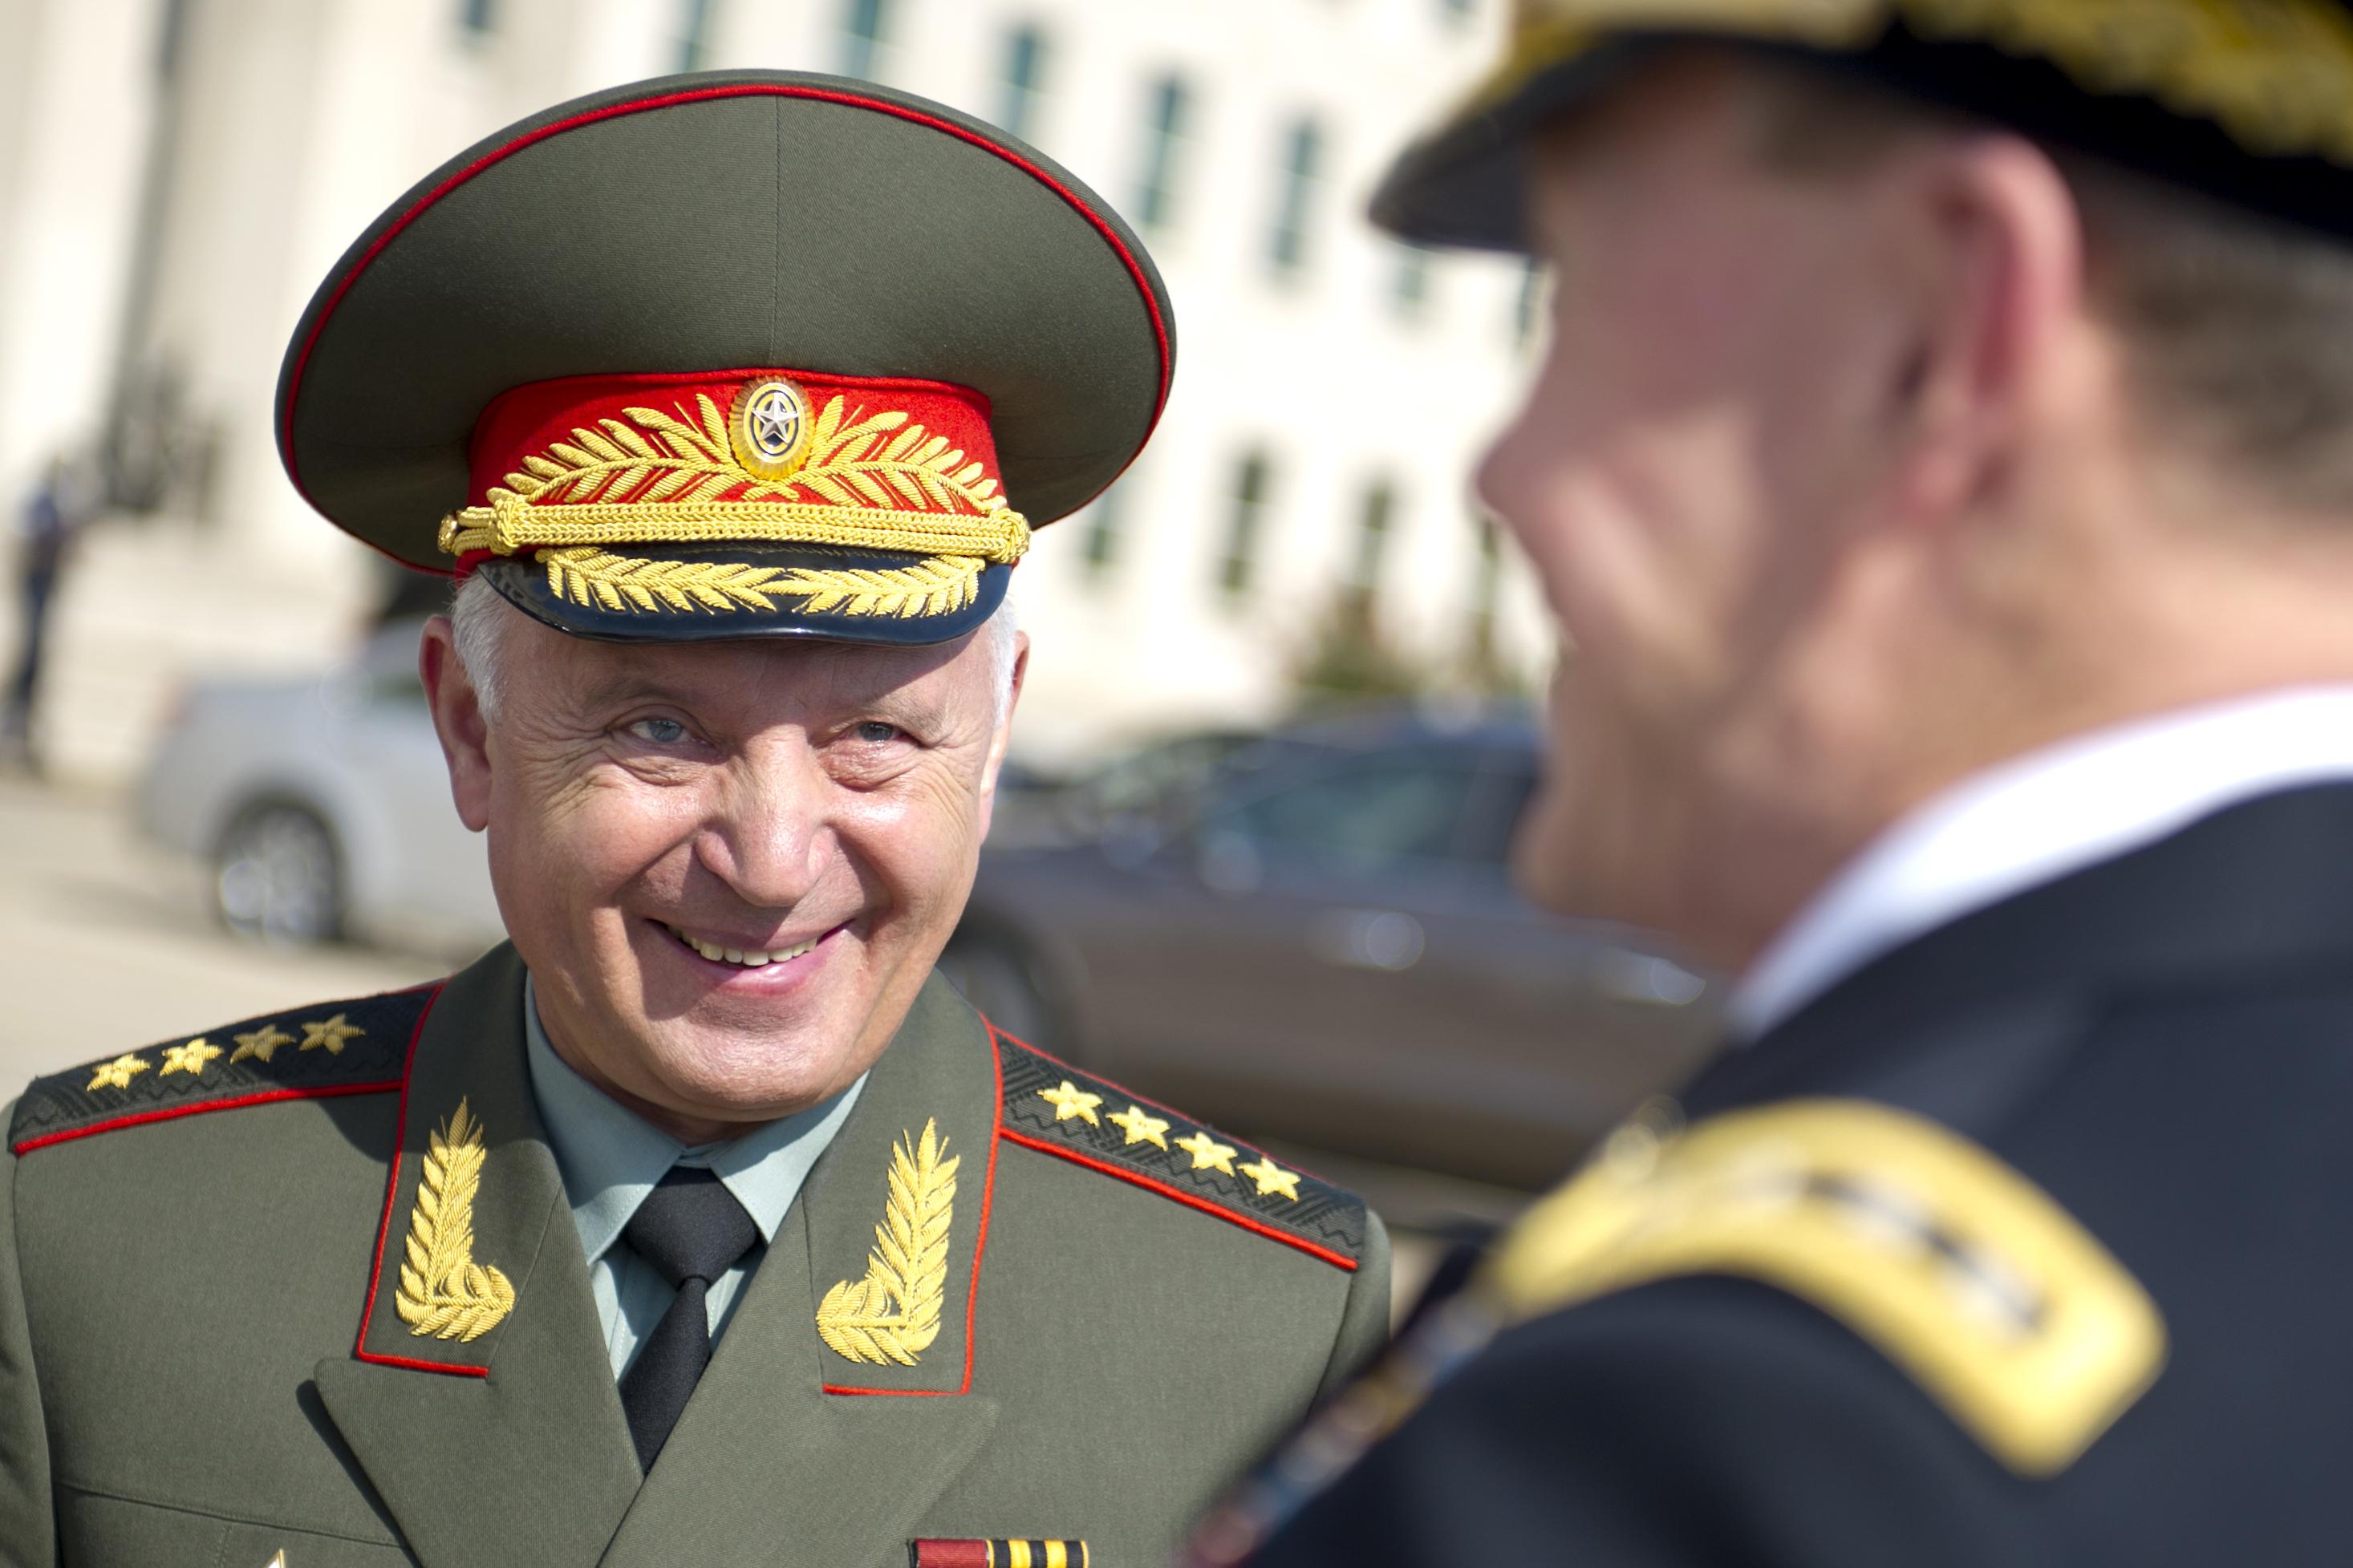 Former KGB Chief Alexandrov Oblast Named New FBI Head